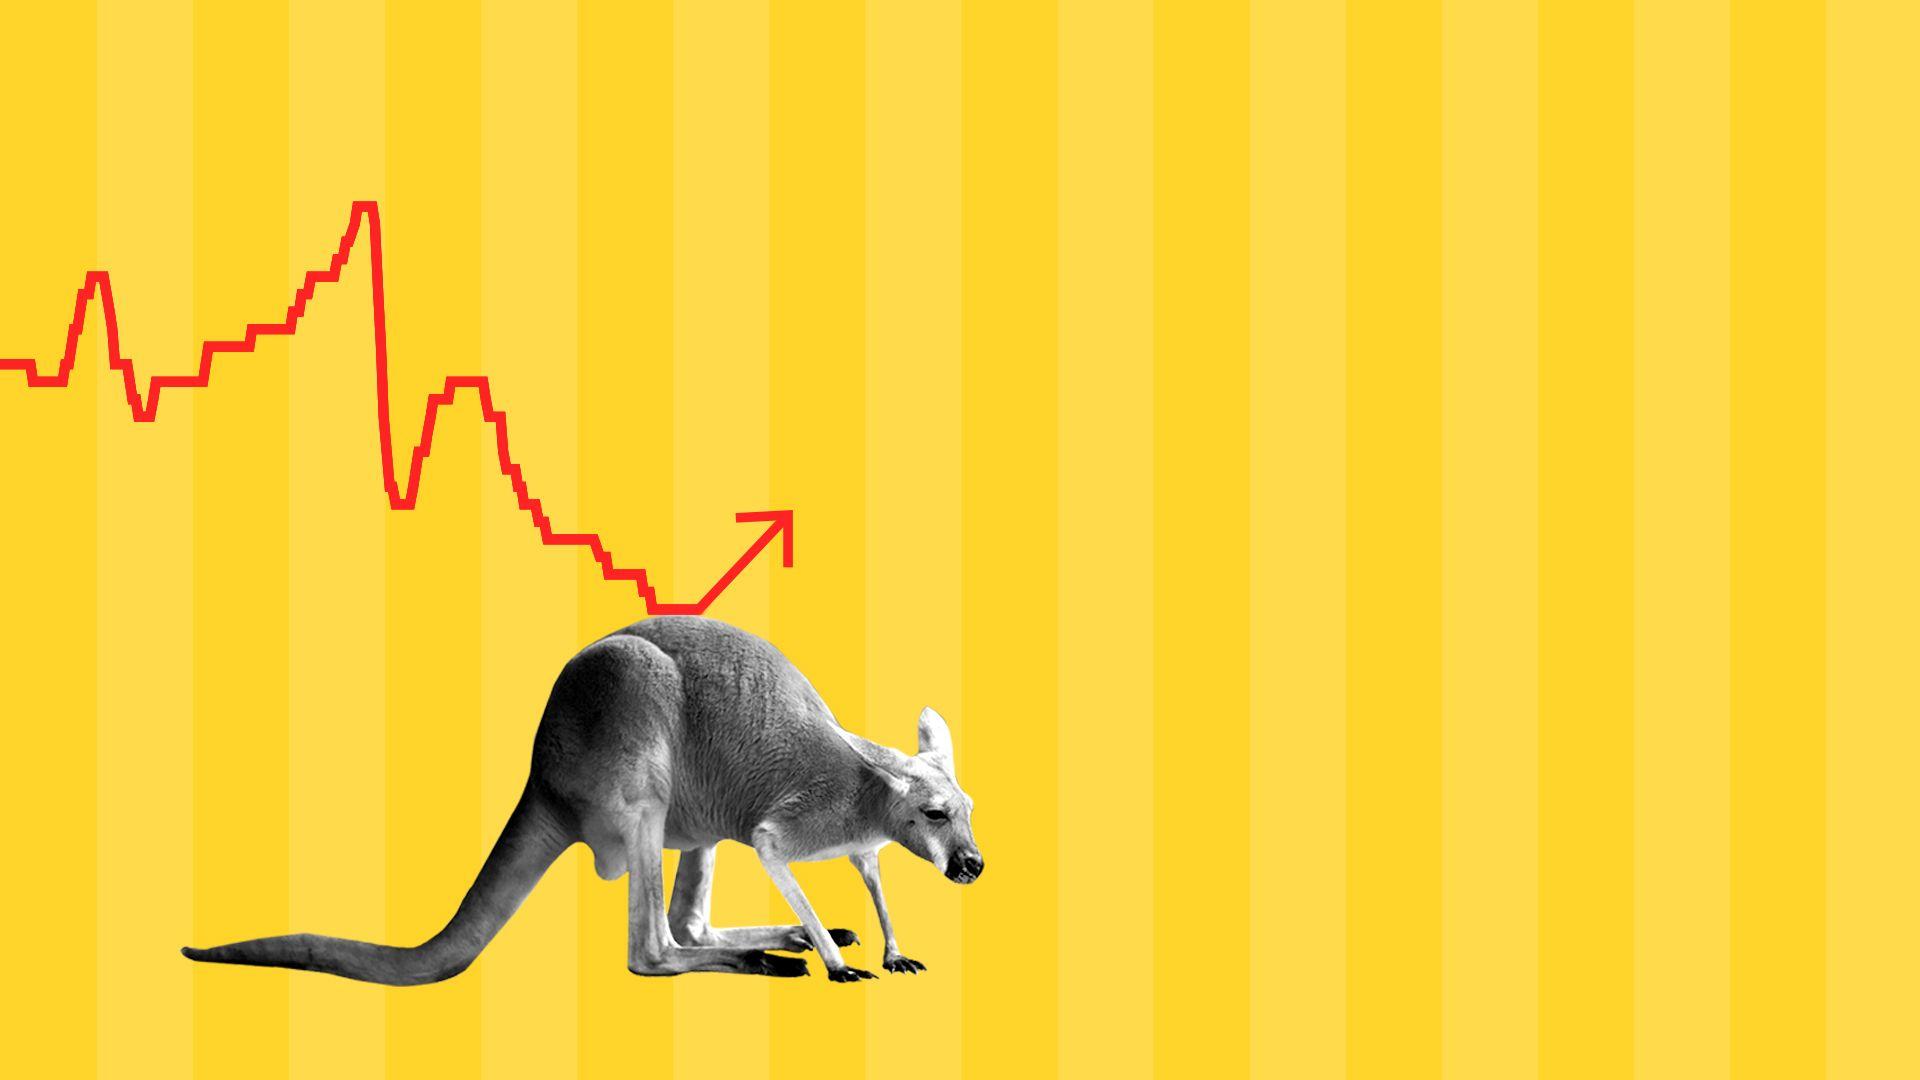 Kangaroo pushing up a stock chart